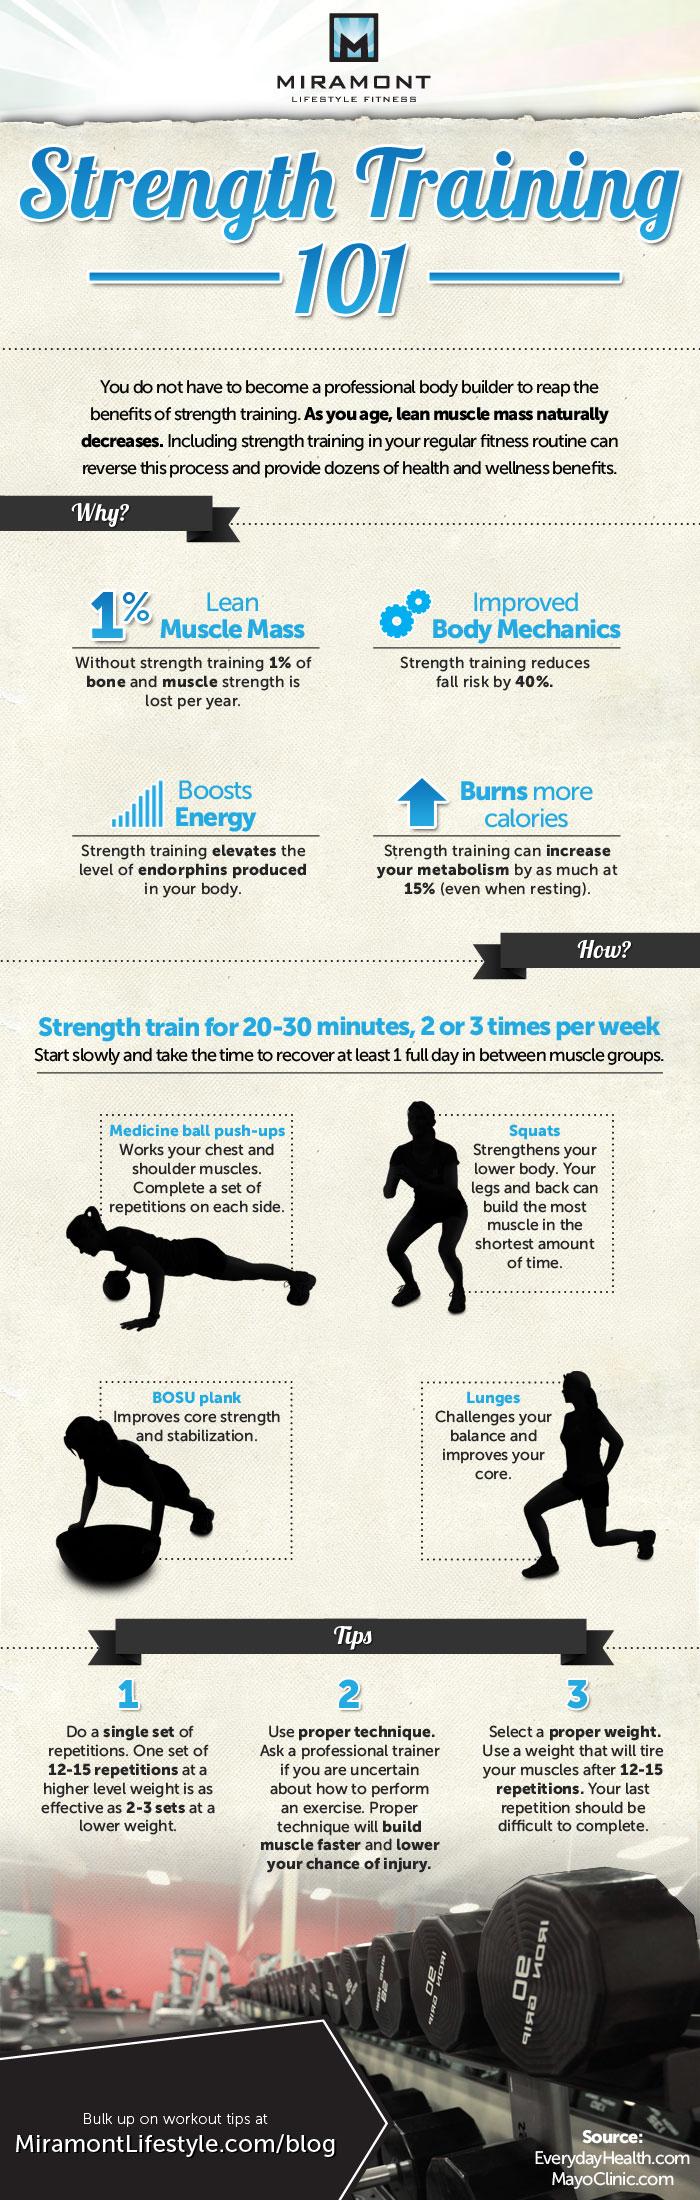 infographic12-strength-training1